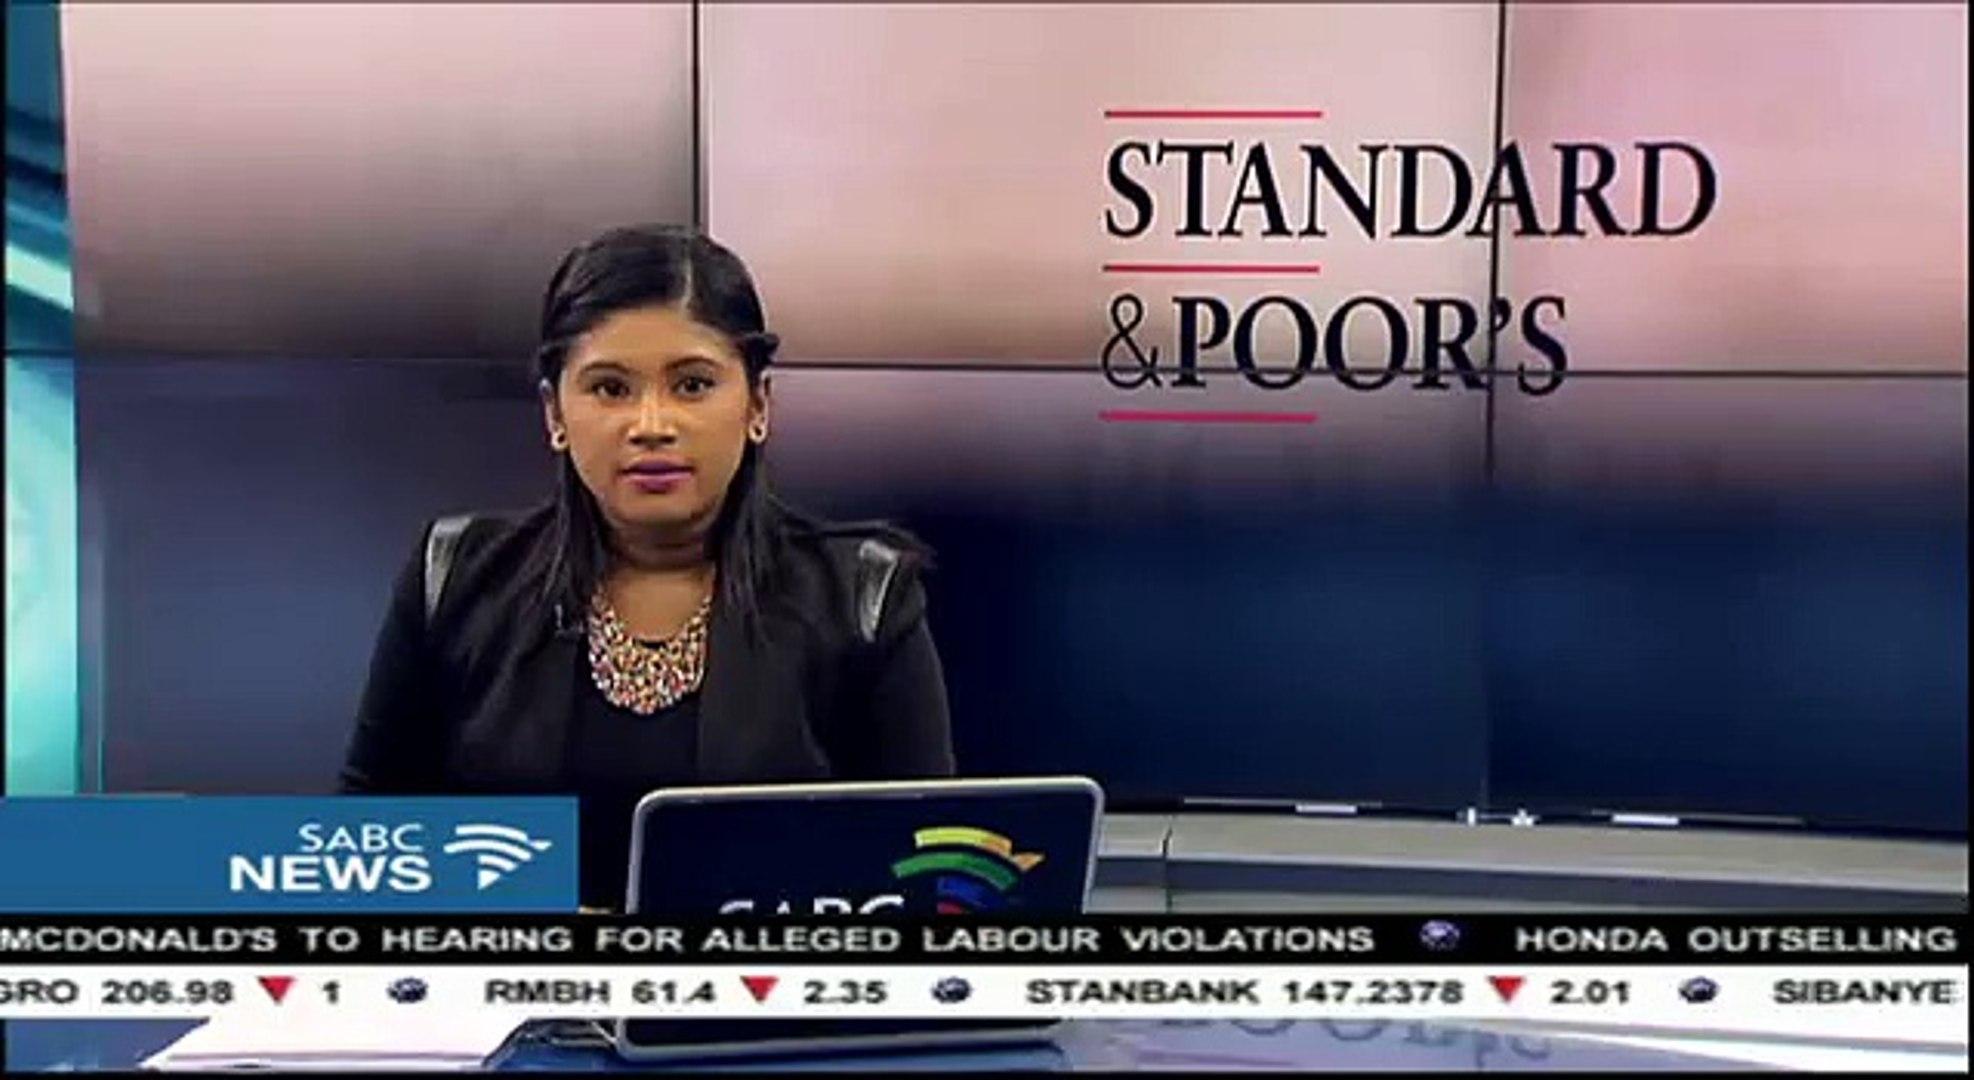 BREAKING NEWS: South Africa avoids junk status